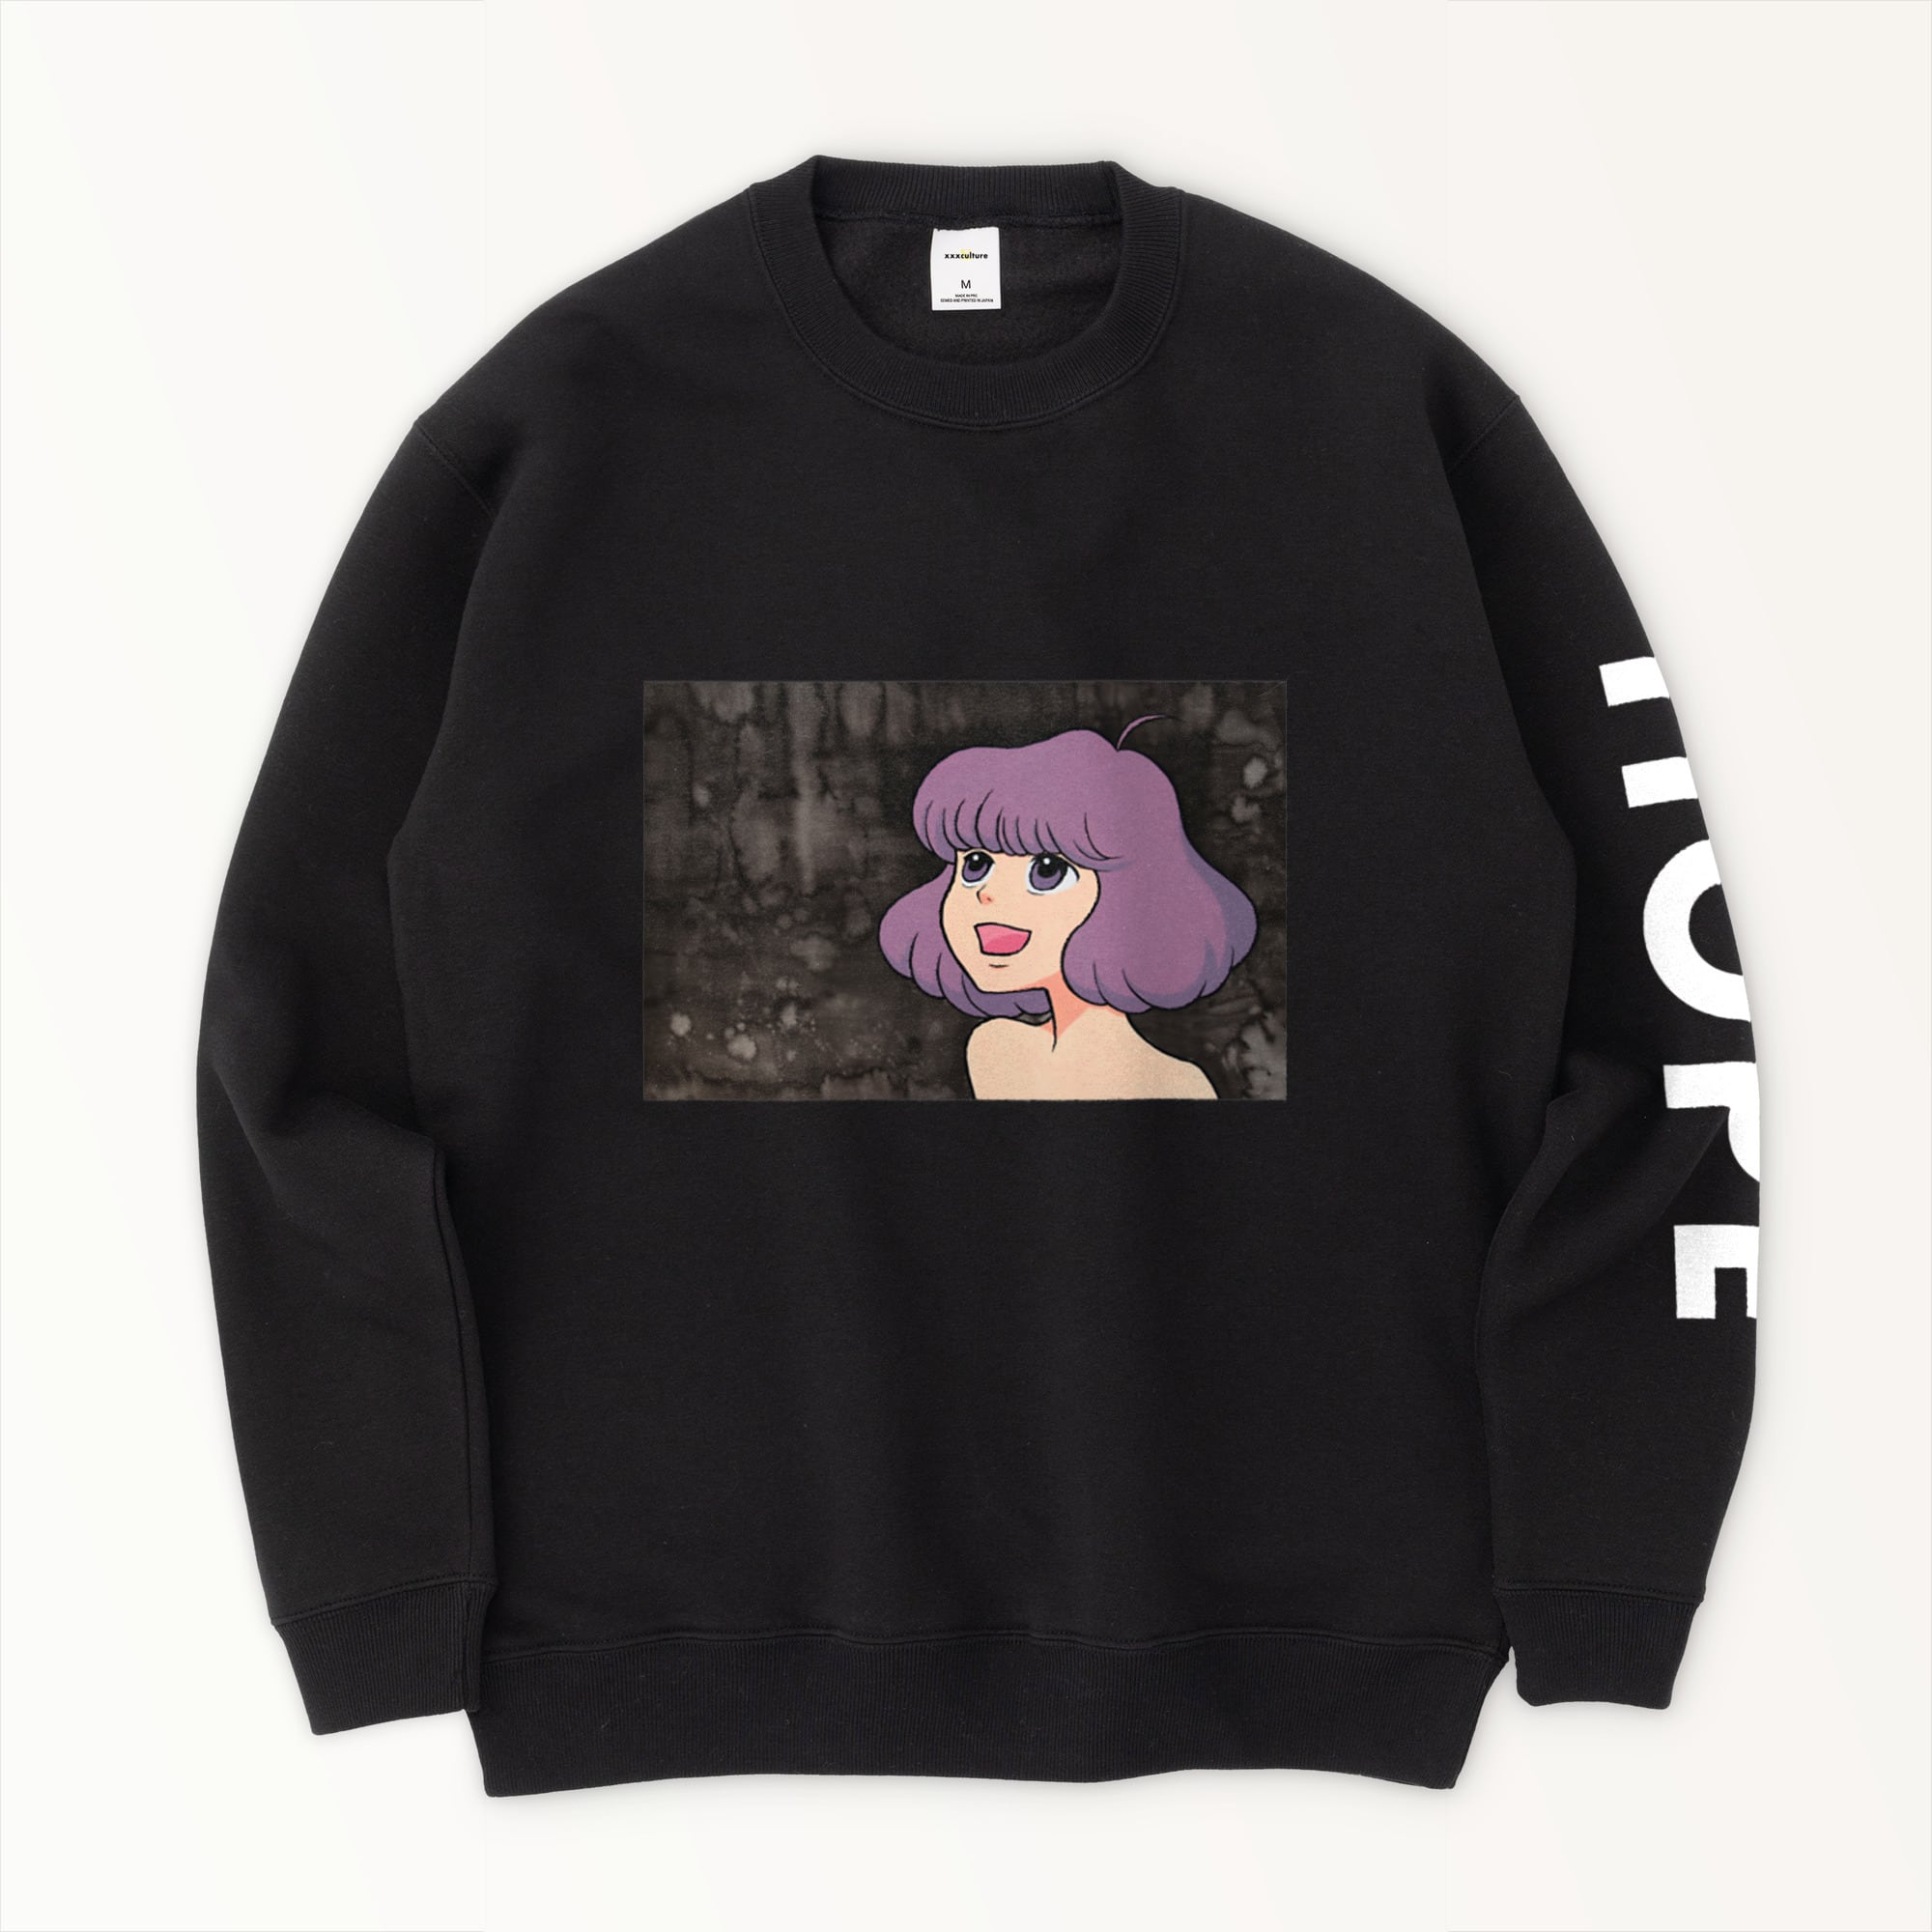 xxxculture HOPE ART - SWEATSHIRTS - BLACK